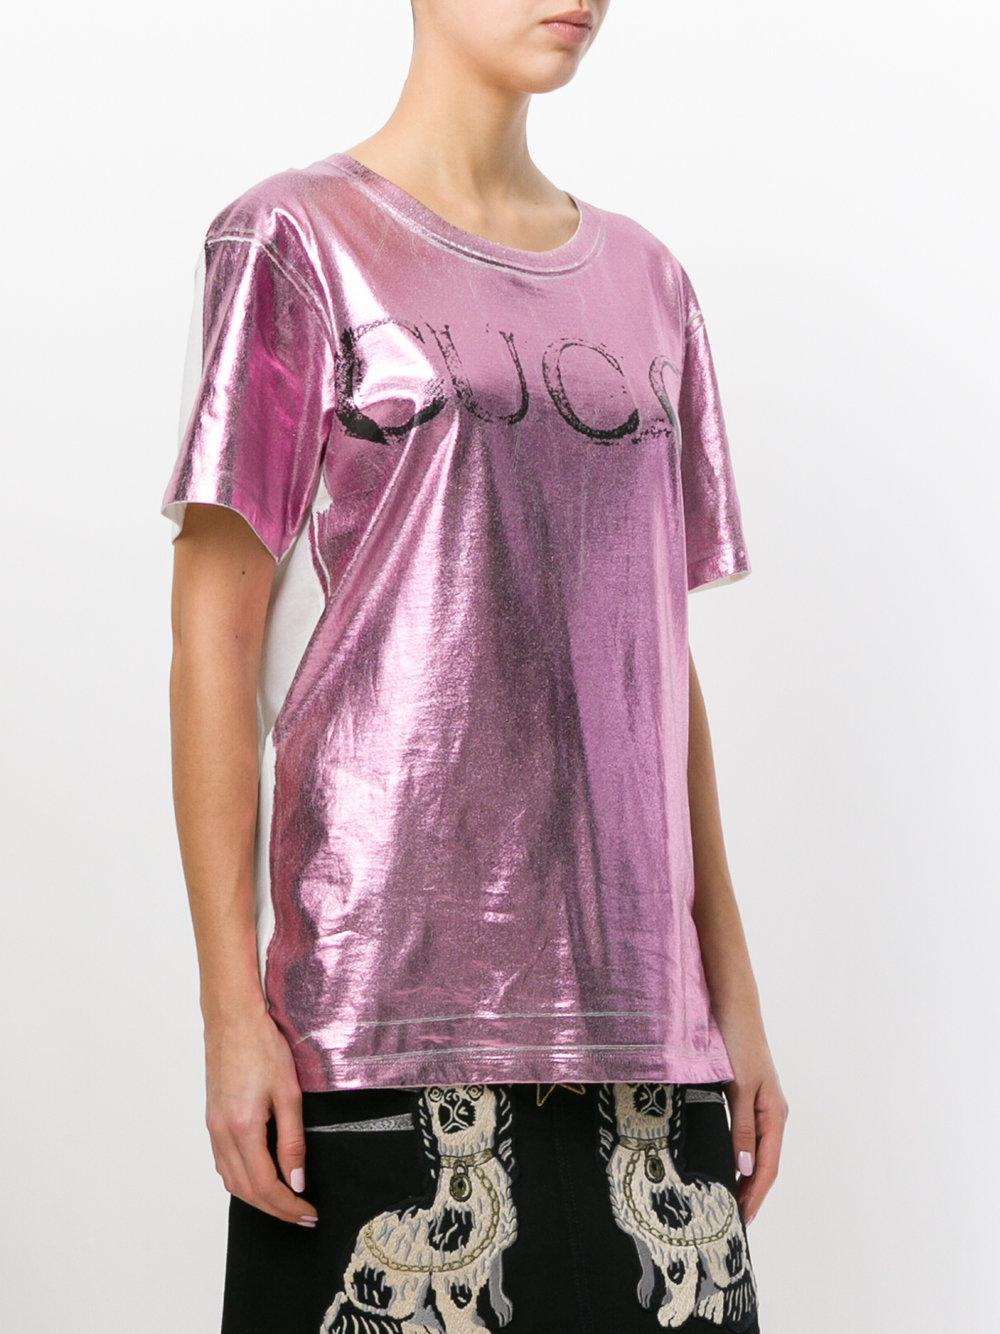 c4b44794a2da Gucci Metallic Faded Logo Print T-shirt in Pink - Lyst